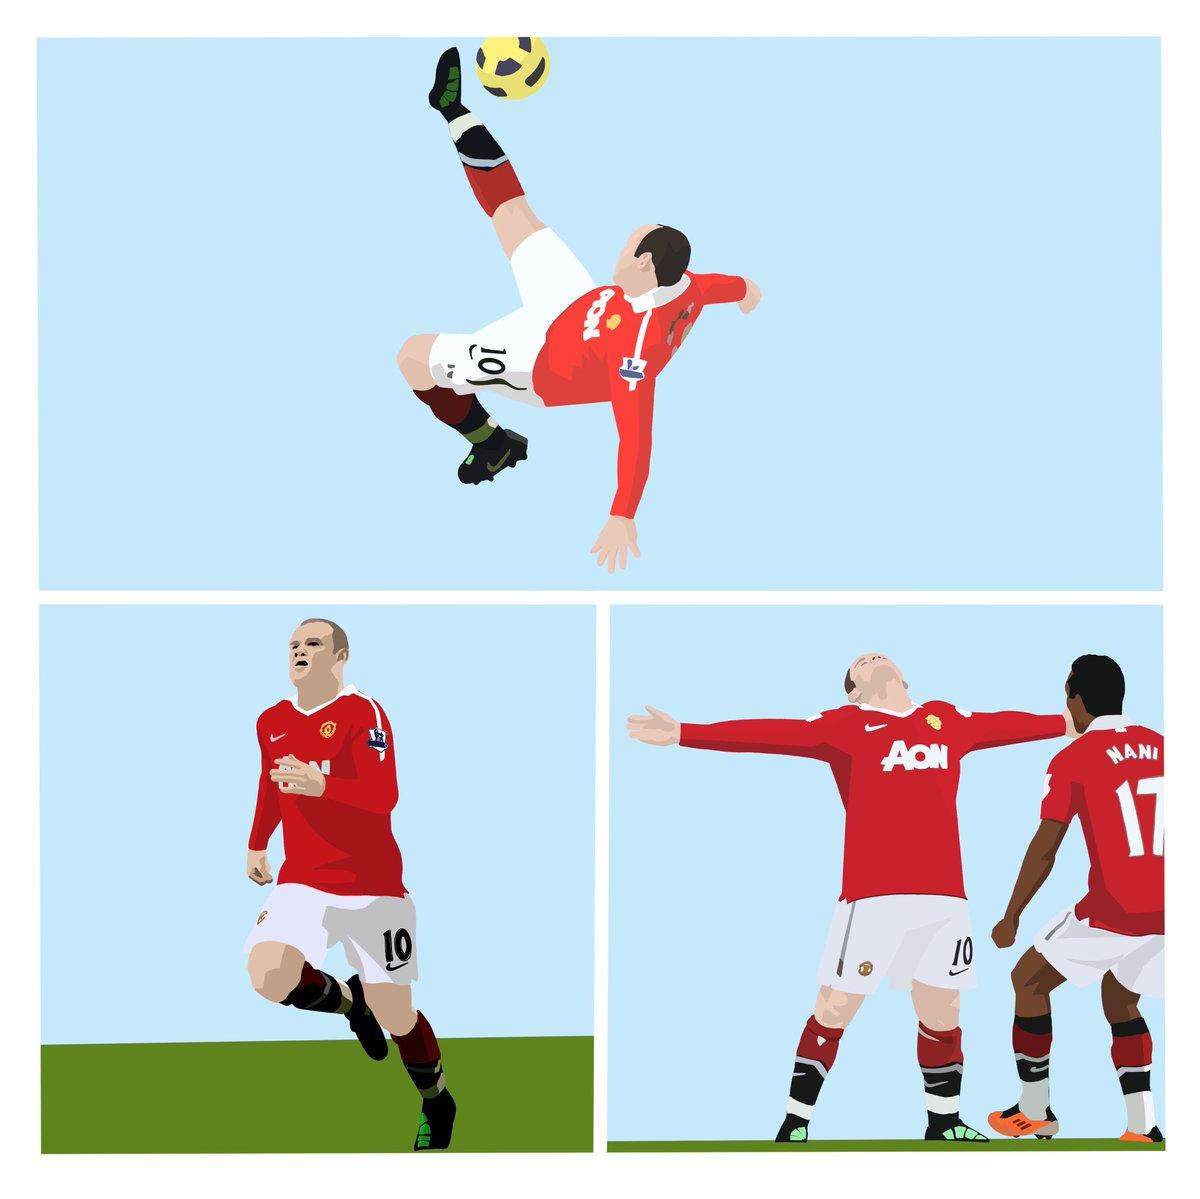 Iconic Goal. Wayne Rooney @ManUtd v Manchester City 2011 #manchesterunited #manunited #manutd #manchesterderby #waynerooney #rooney #football #footballart #digitalart #iconic #rooney10 #premierleague #premierleagueart https://t.co/7GlekVnOg2